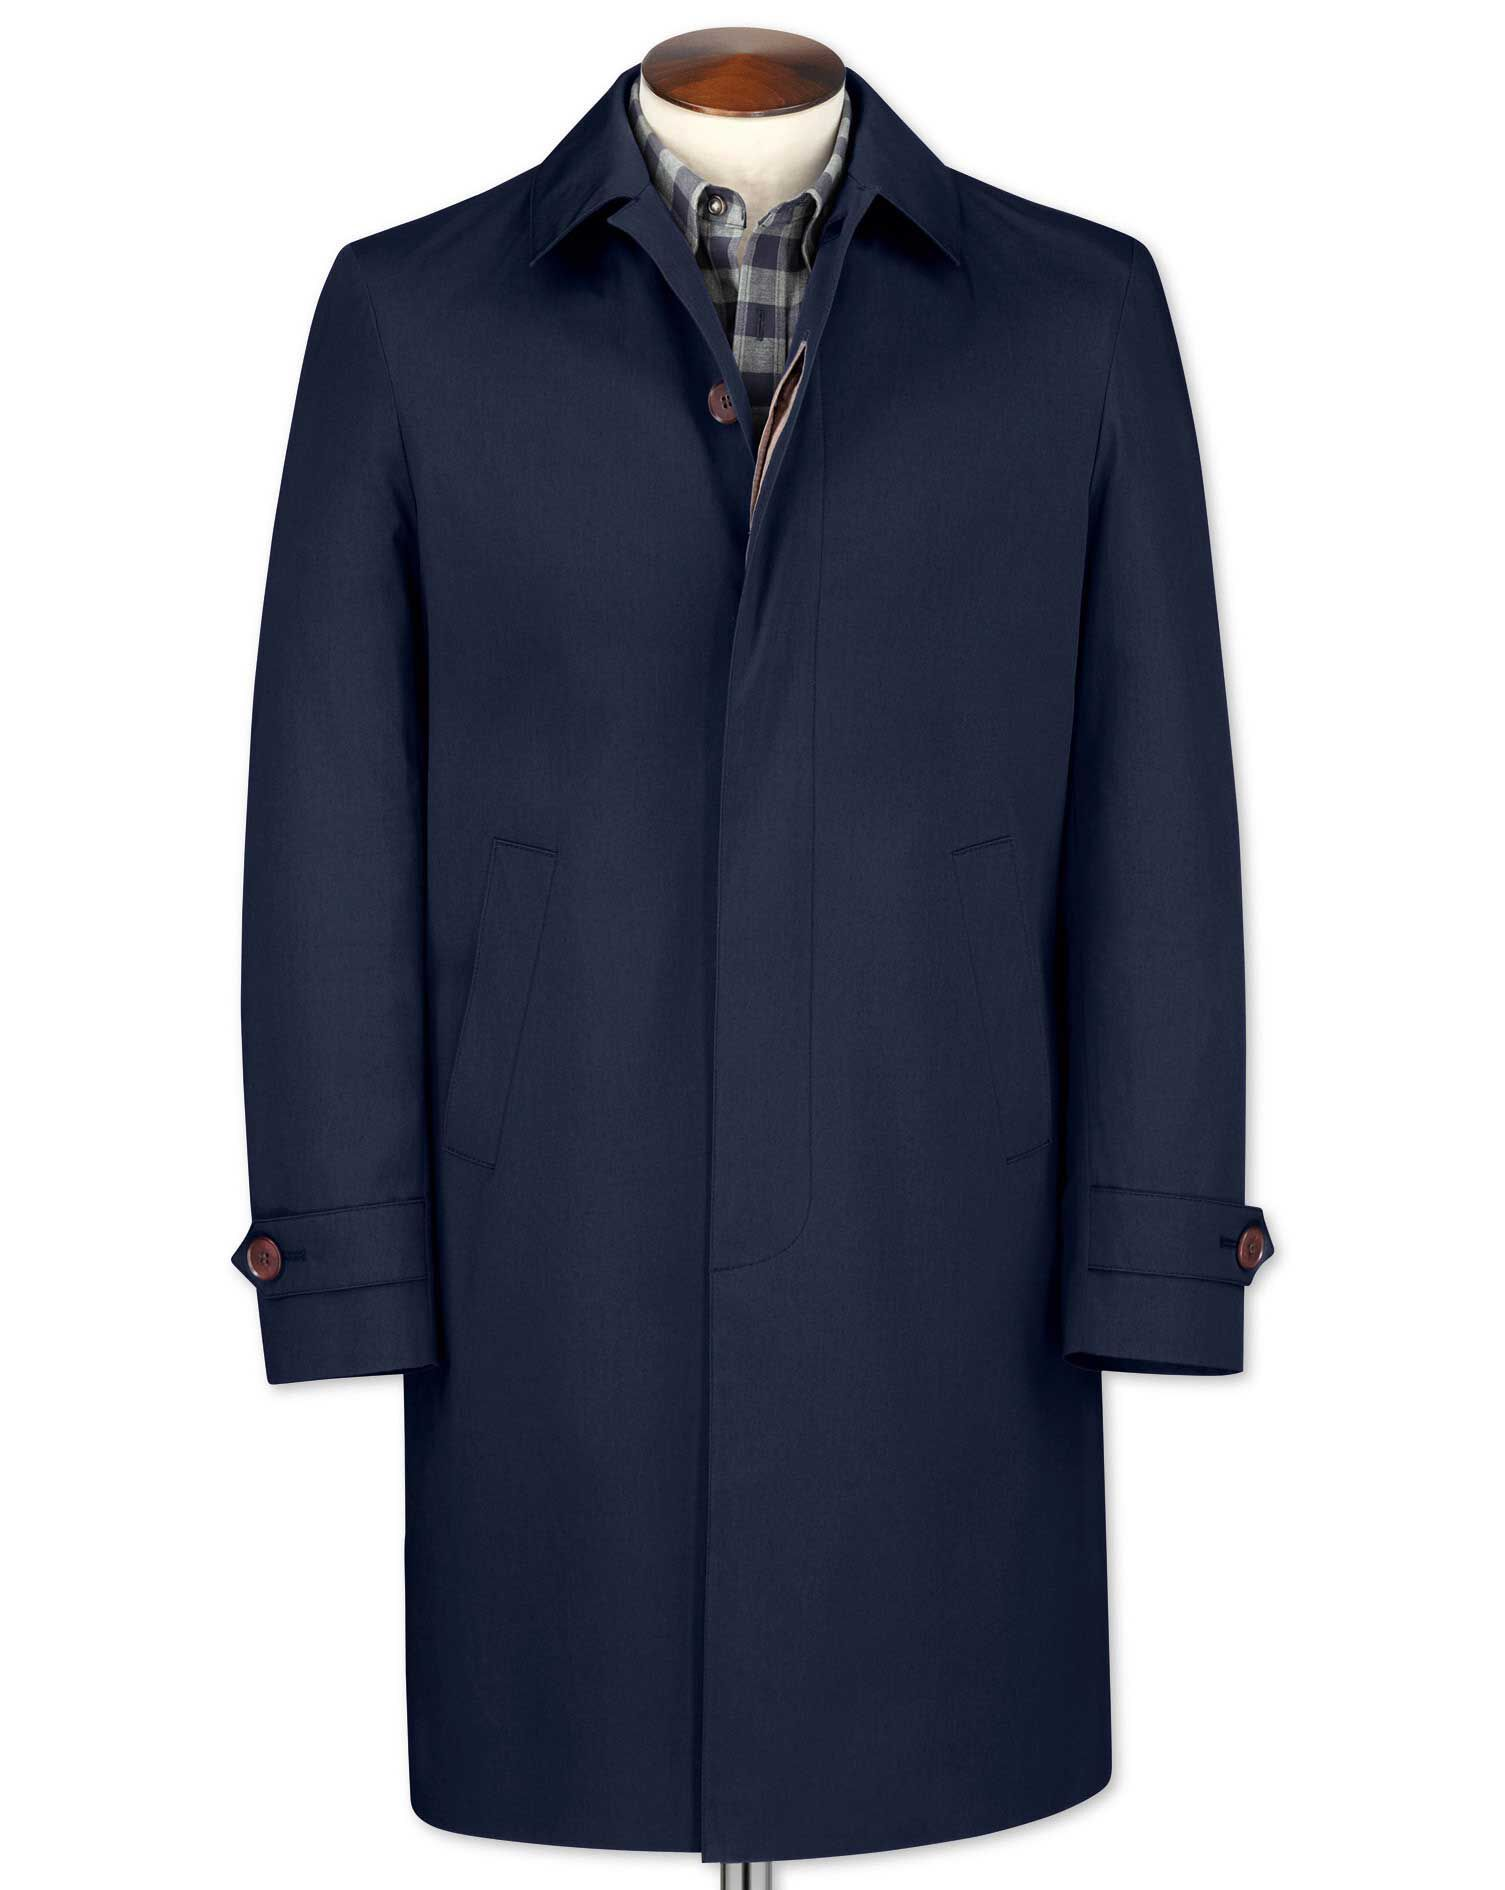 1950s Men's Jackets Slim Fit Blue RainCotton coat Size 48 Regular by Charles Tyrwhitt £99.00 AT vintagedancer.com